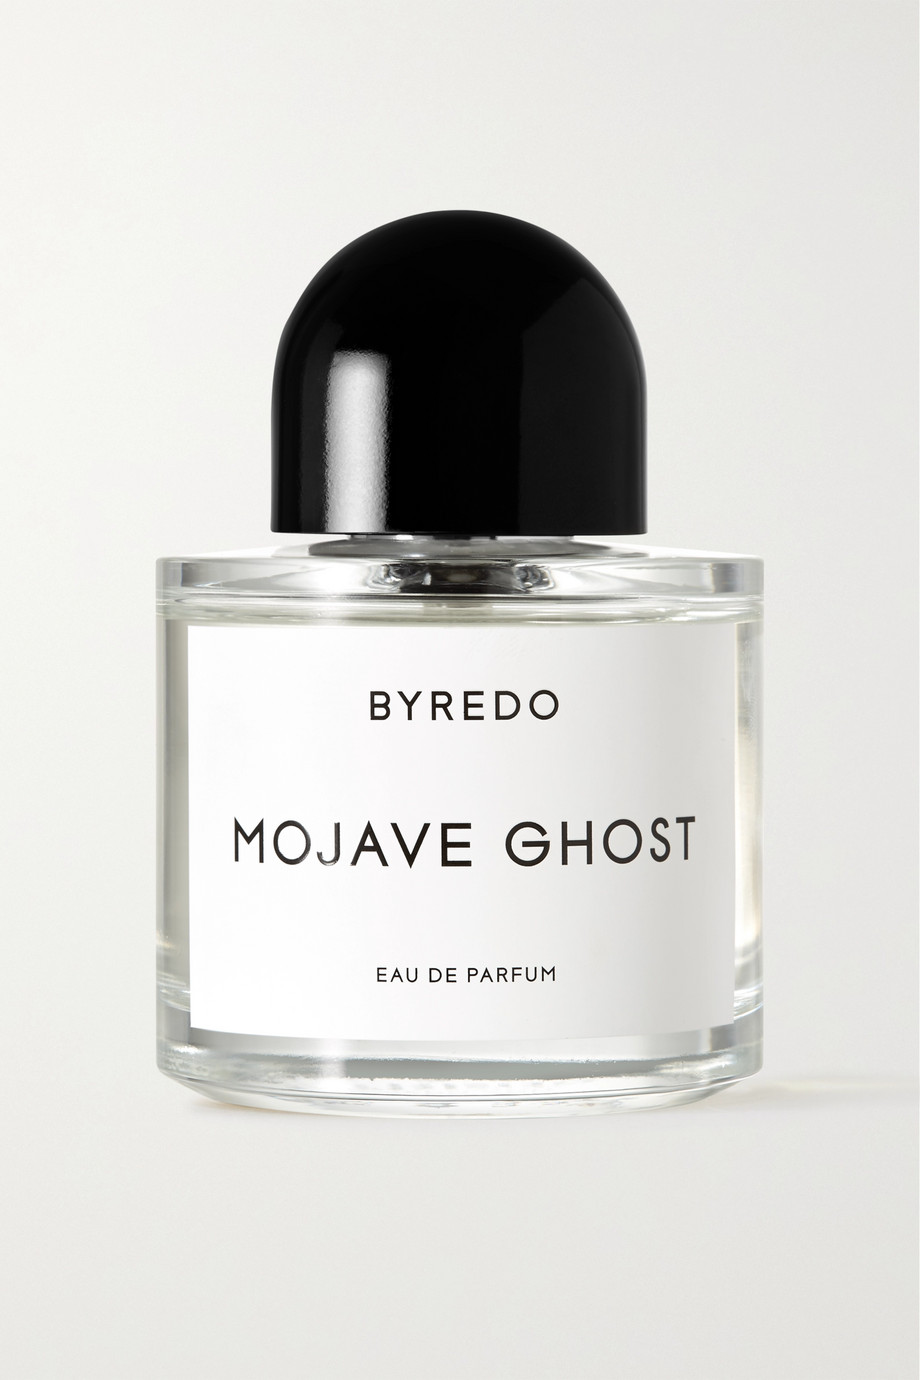 Byredo Mojave Ghost, 100 ml – Eau de Parfum